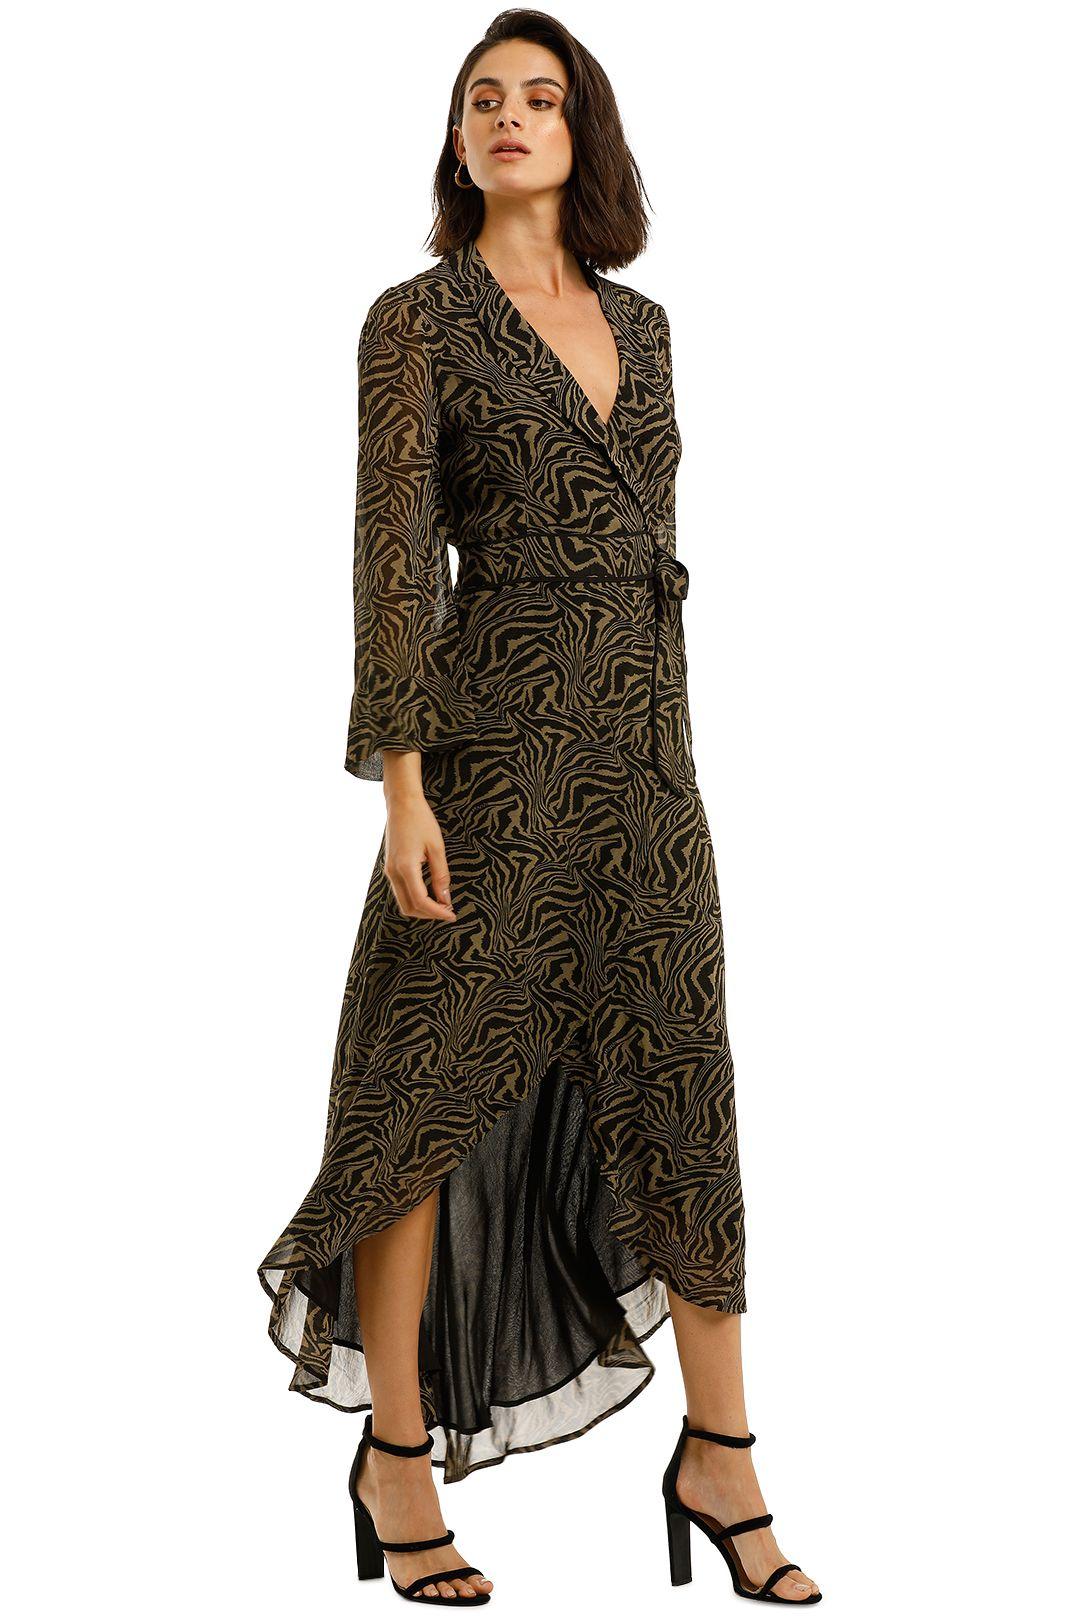 Ganni-Printed-Georgette-LS-Long-Wrap-Dress-Kalamata-Side